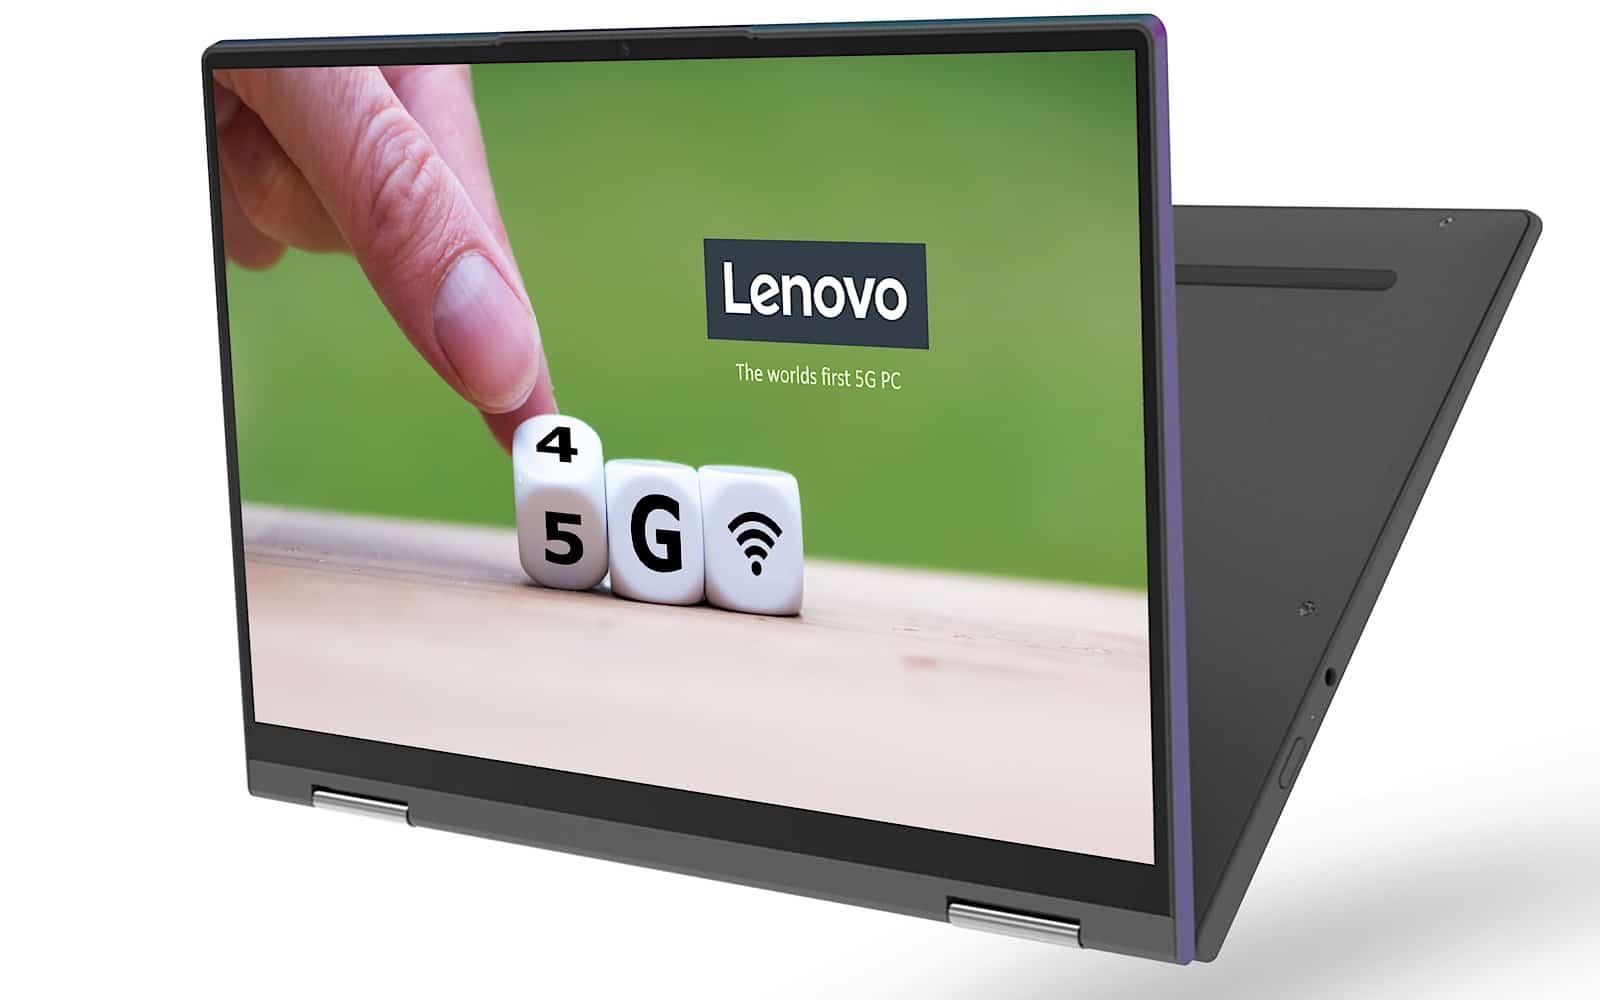 Lenovo, Qualcomm collaborate on 5G laptop – Pickr